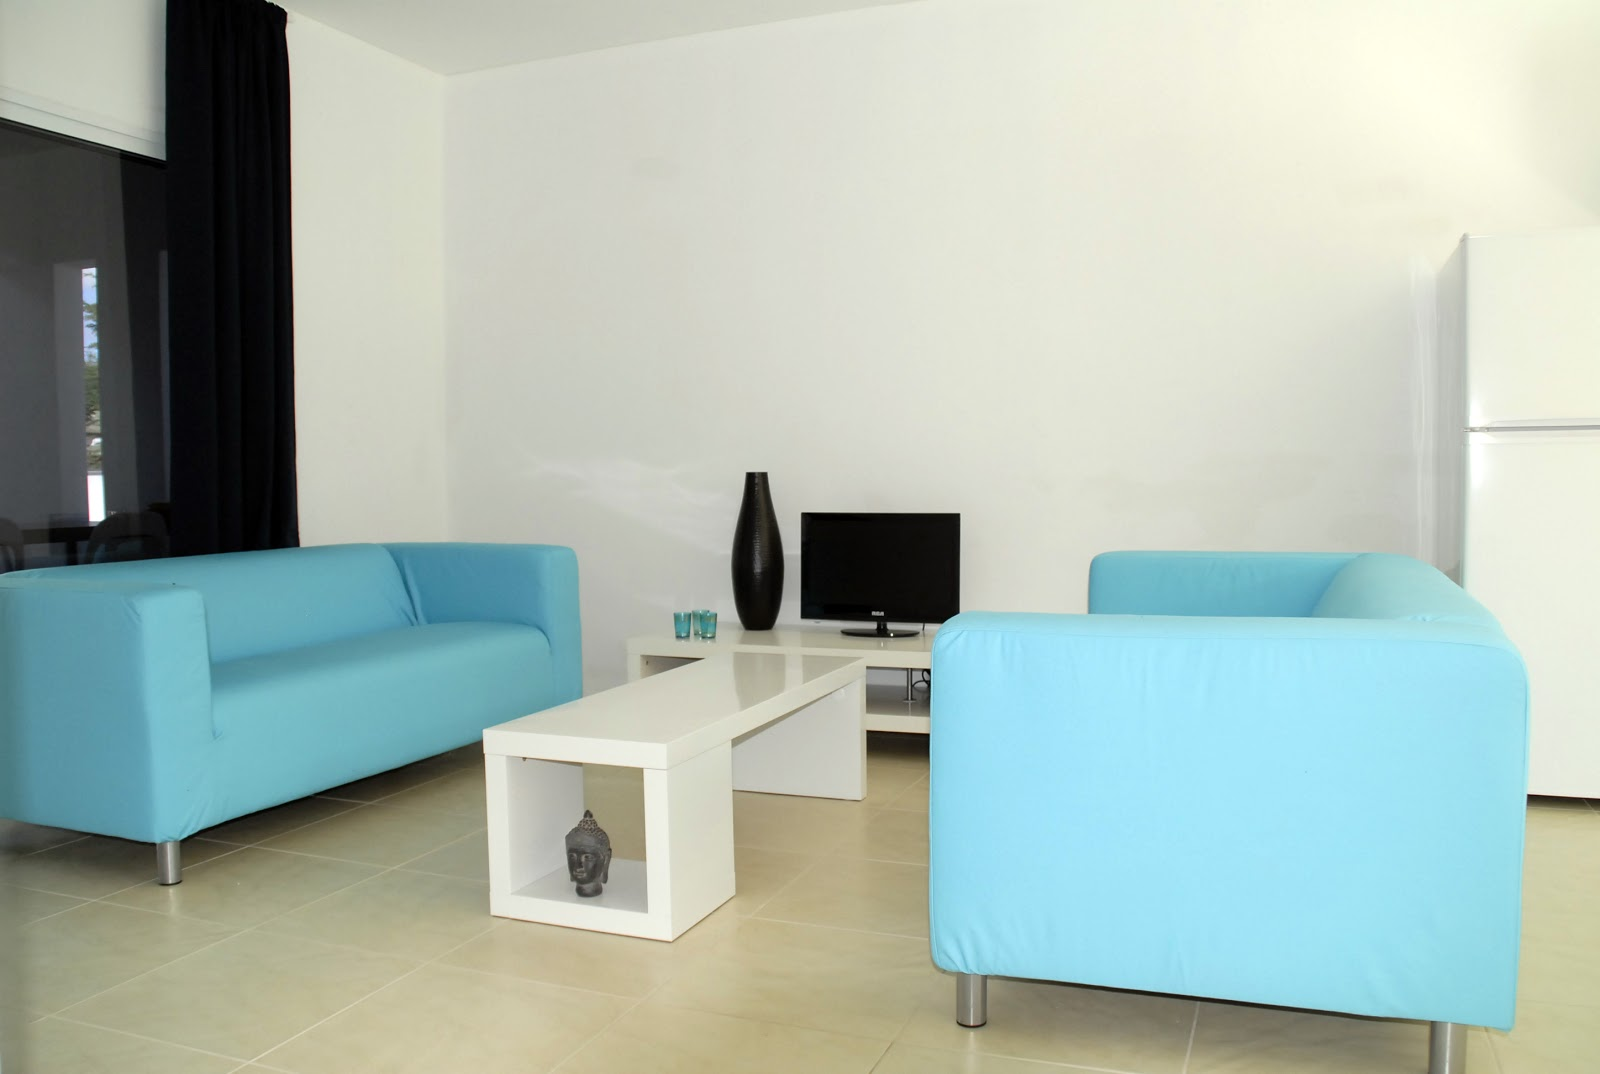 apartments.curacao